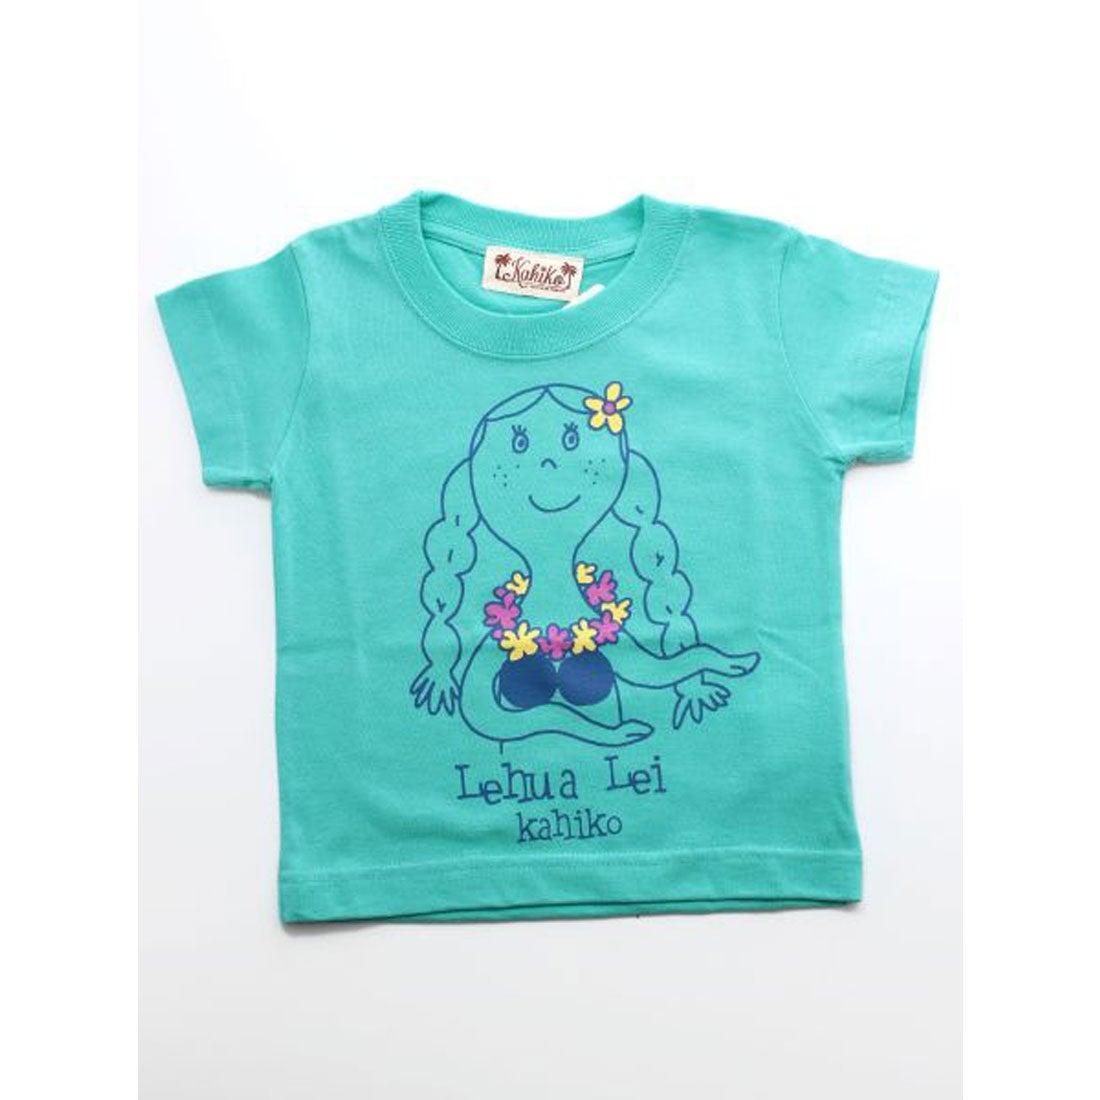 【kahiko】マハロメレKID'S Tシャツ90cm ブルー